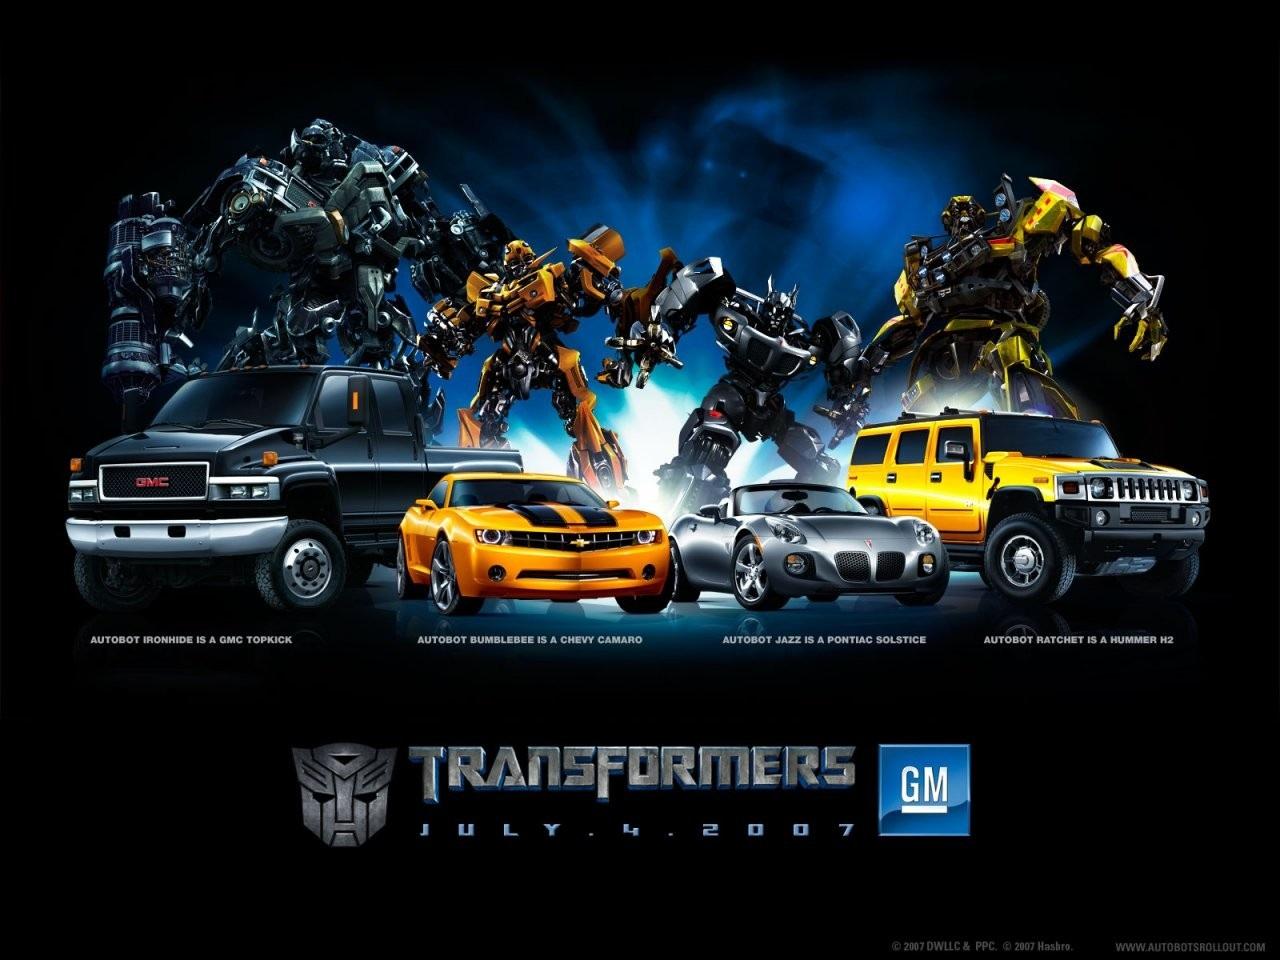 http://1.bp.blogspot.com/-CyRnv1nQs3s/TkdSIS4YTcI/AAAAAAAADAA/Jwwi4cWFV_E/s1600/Transformers_13.jpg